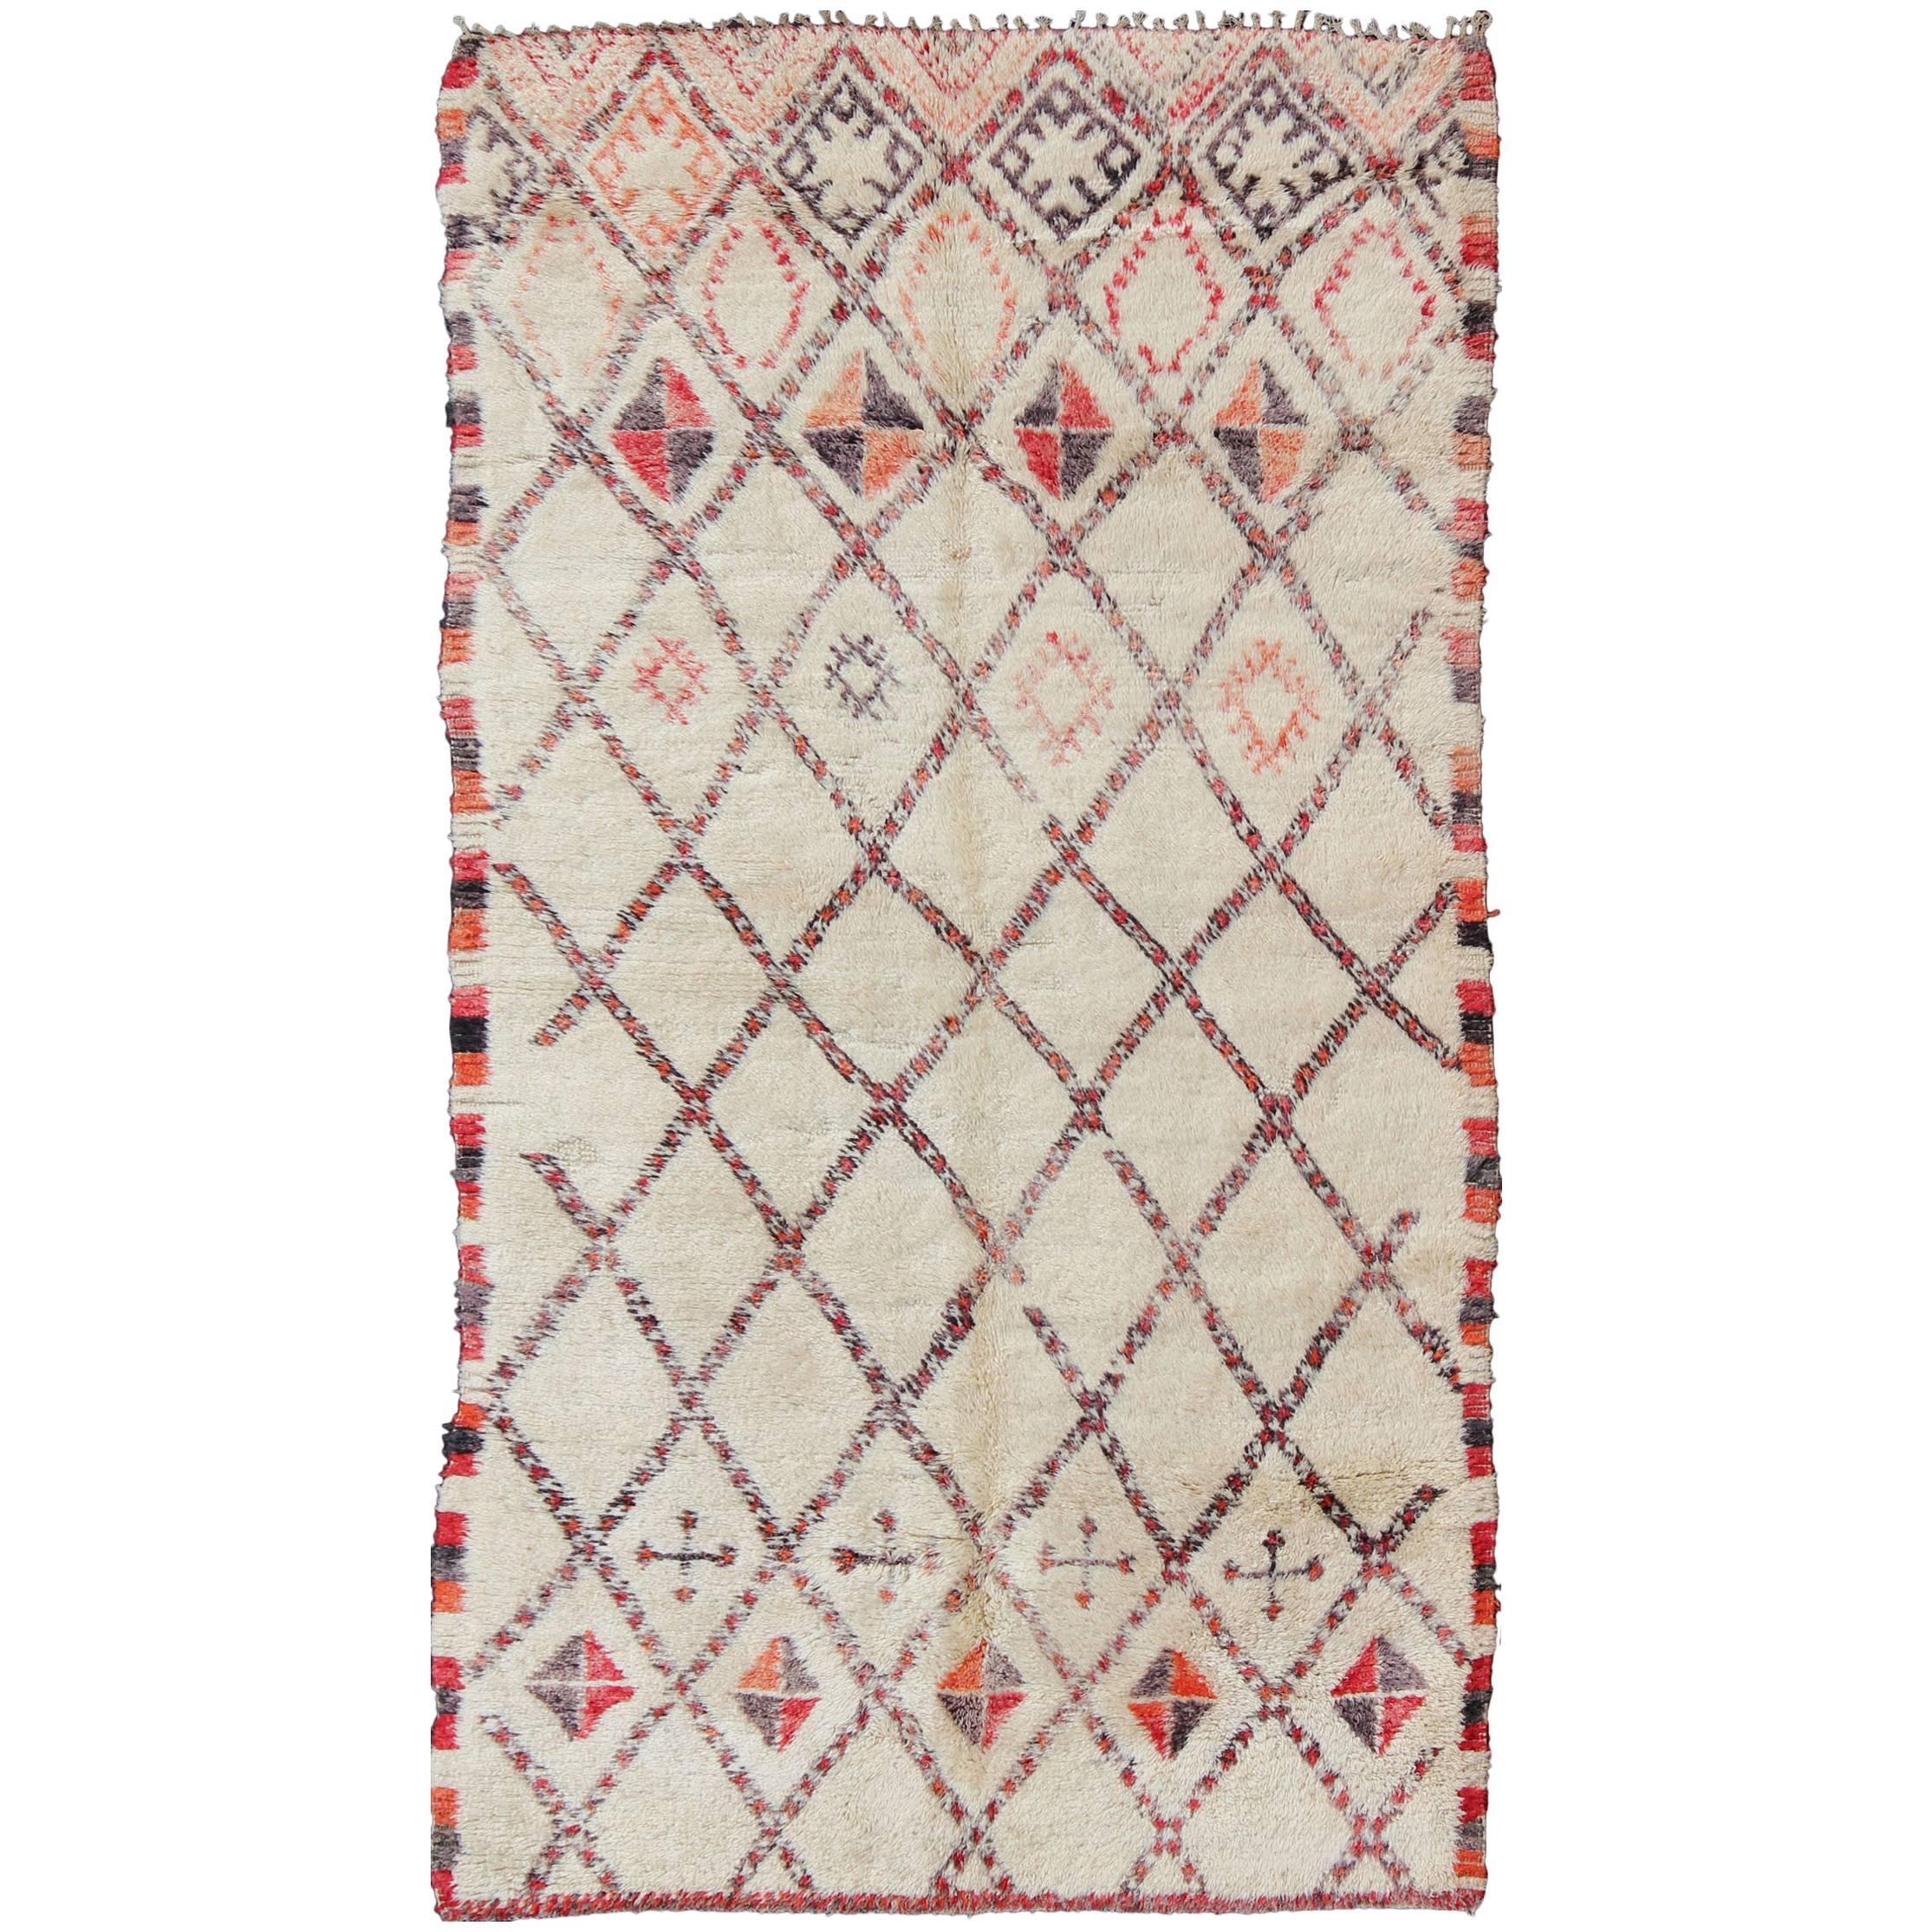 Vintage Moroccan Beni Ouarain Rug